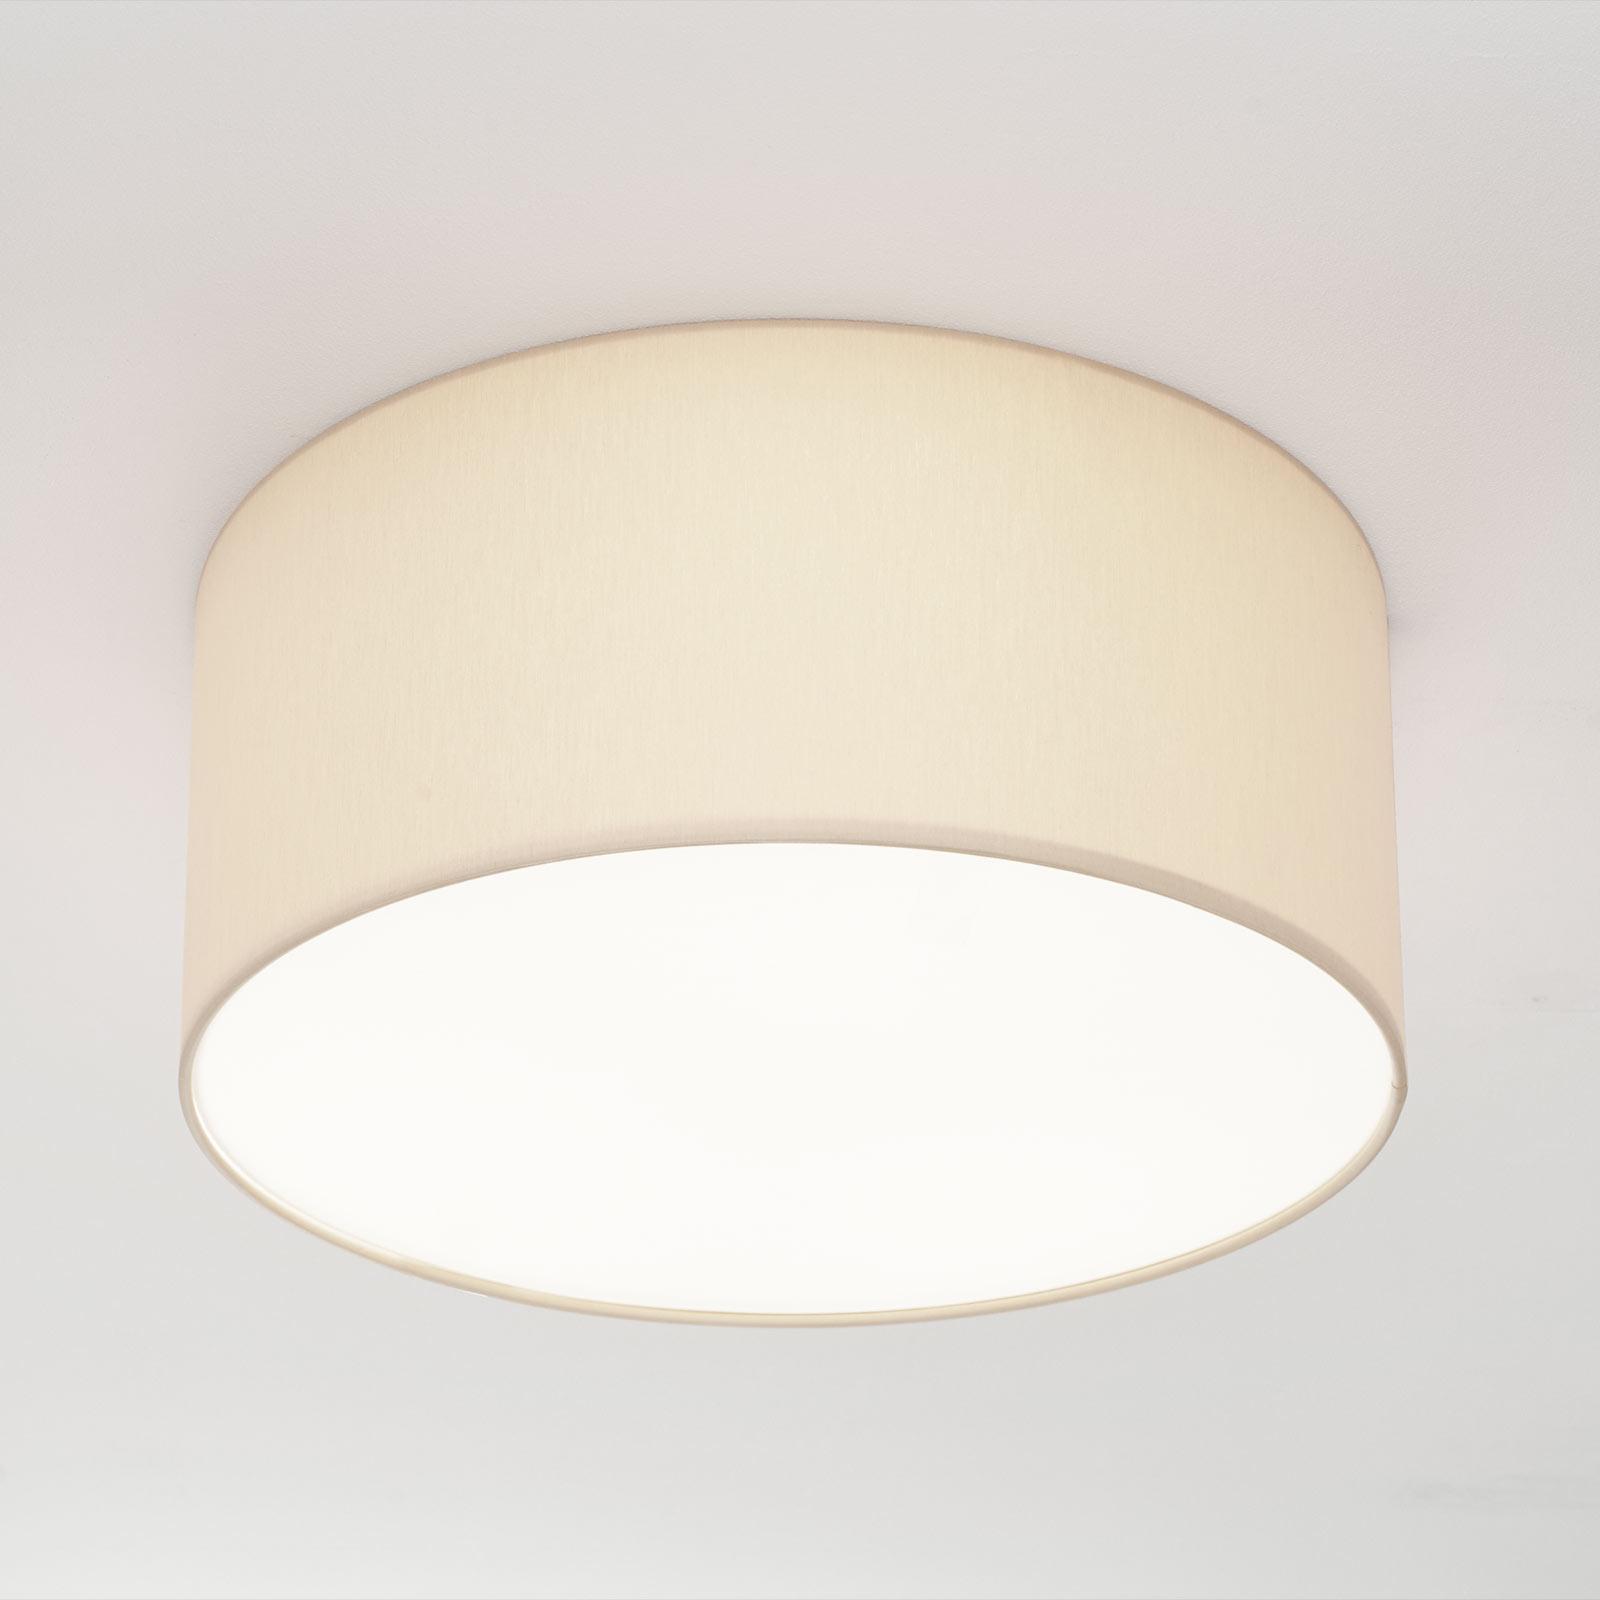 Szampańska lampa sufitowa MARA, 40 cm